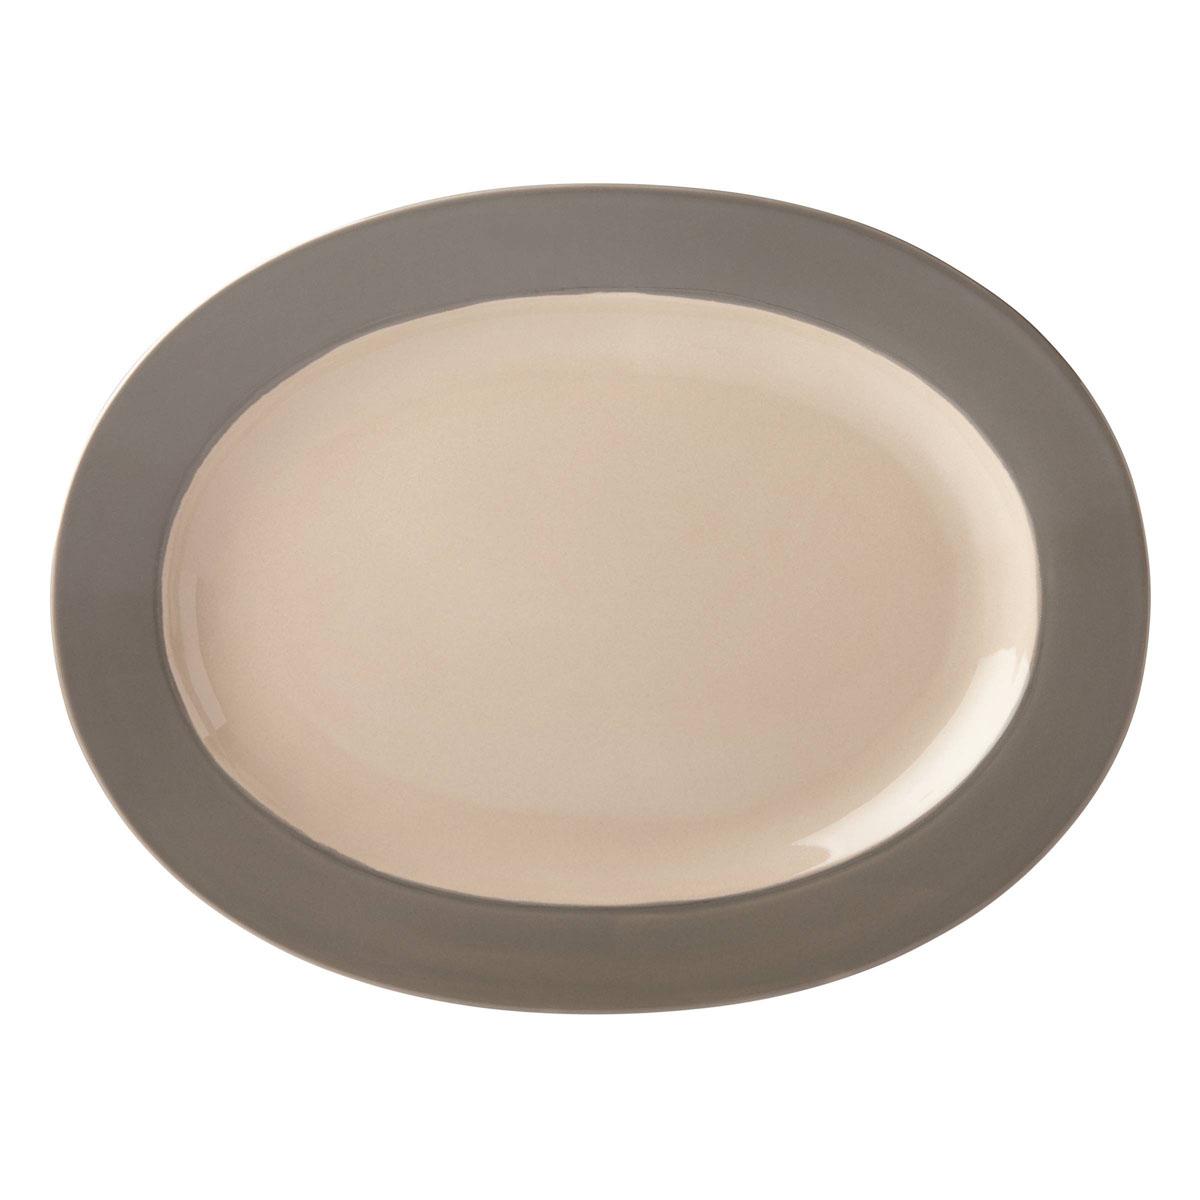 kate spade new york Lenox Stoneware Nolita Gray Platter